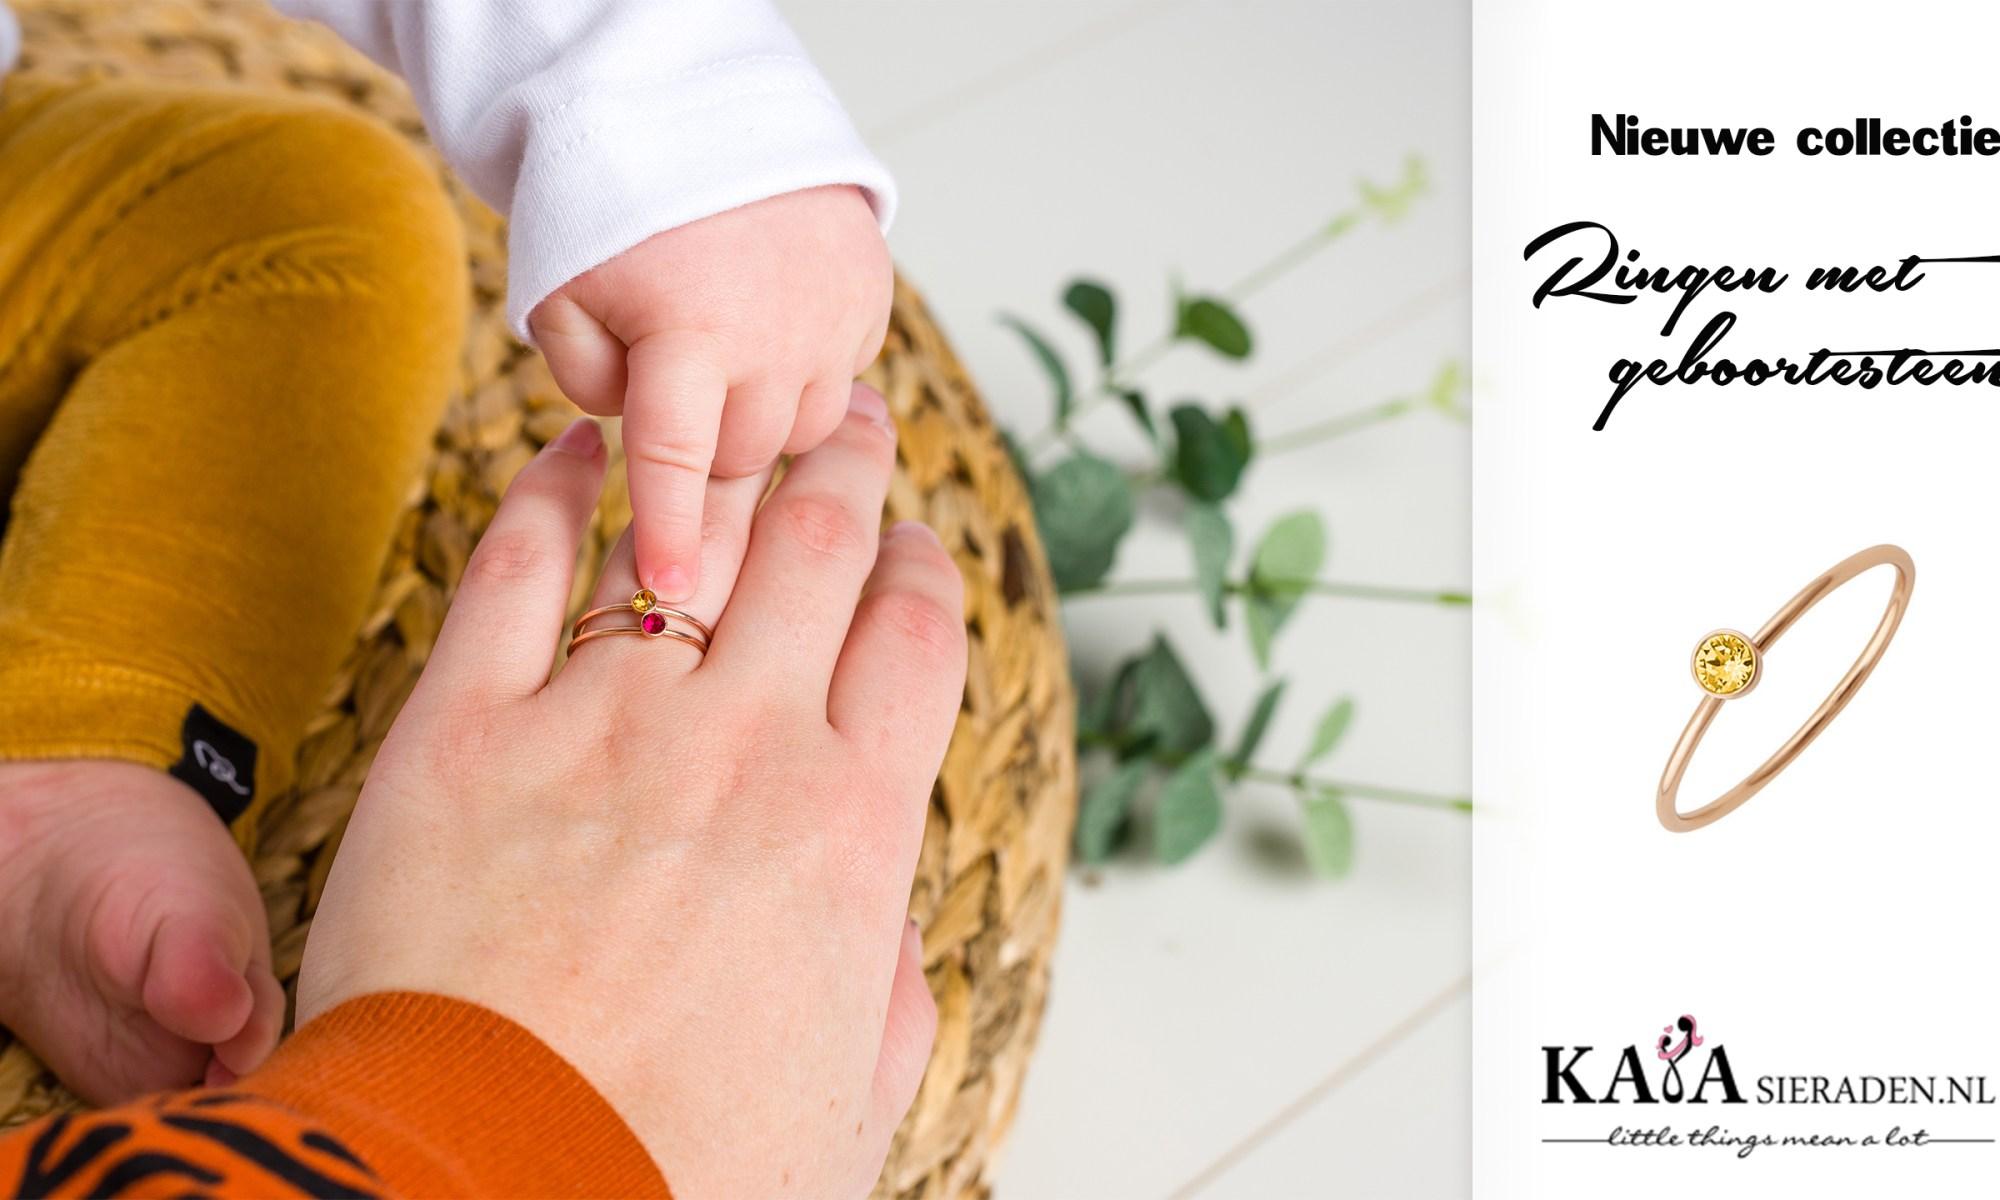 Kaya sieraden ringen met geboortesteen zilver goud rose review mama blog www.liefkleinwonder.nl